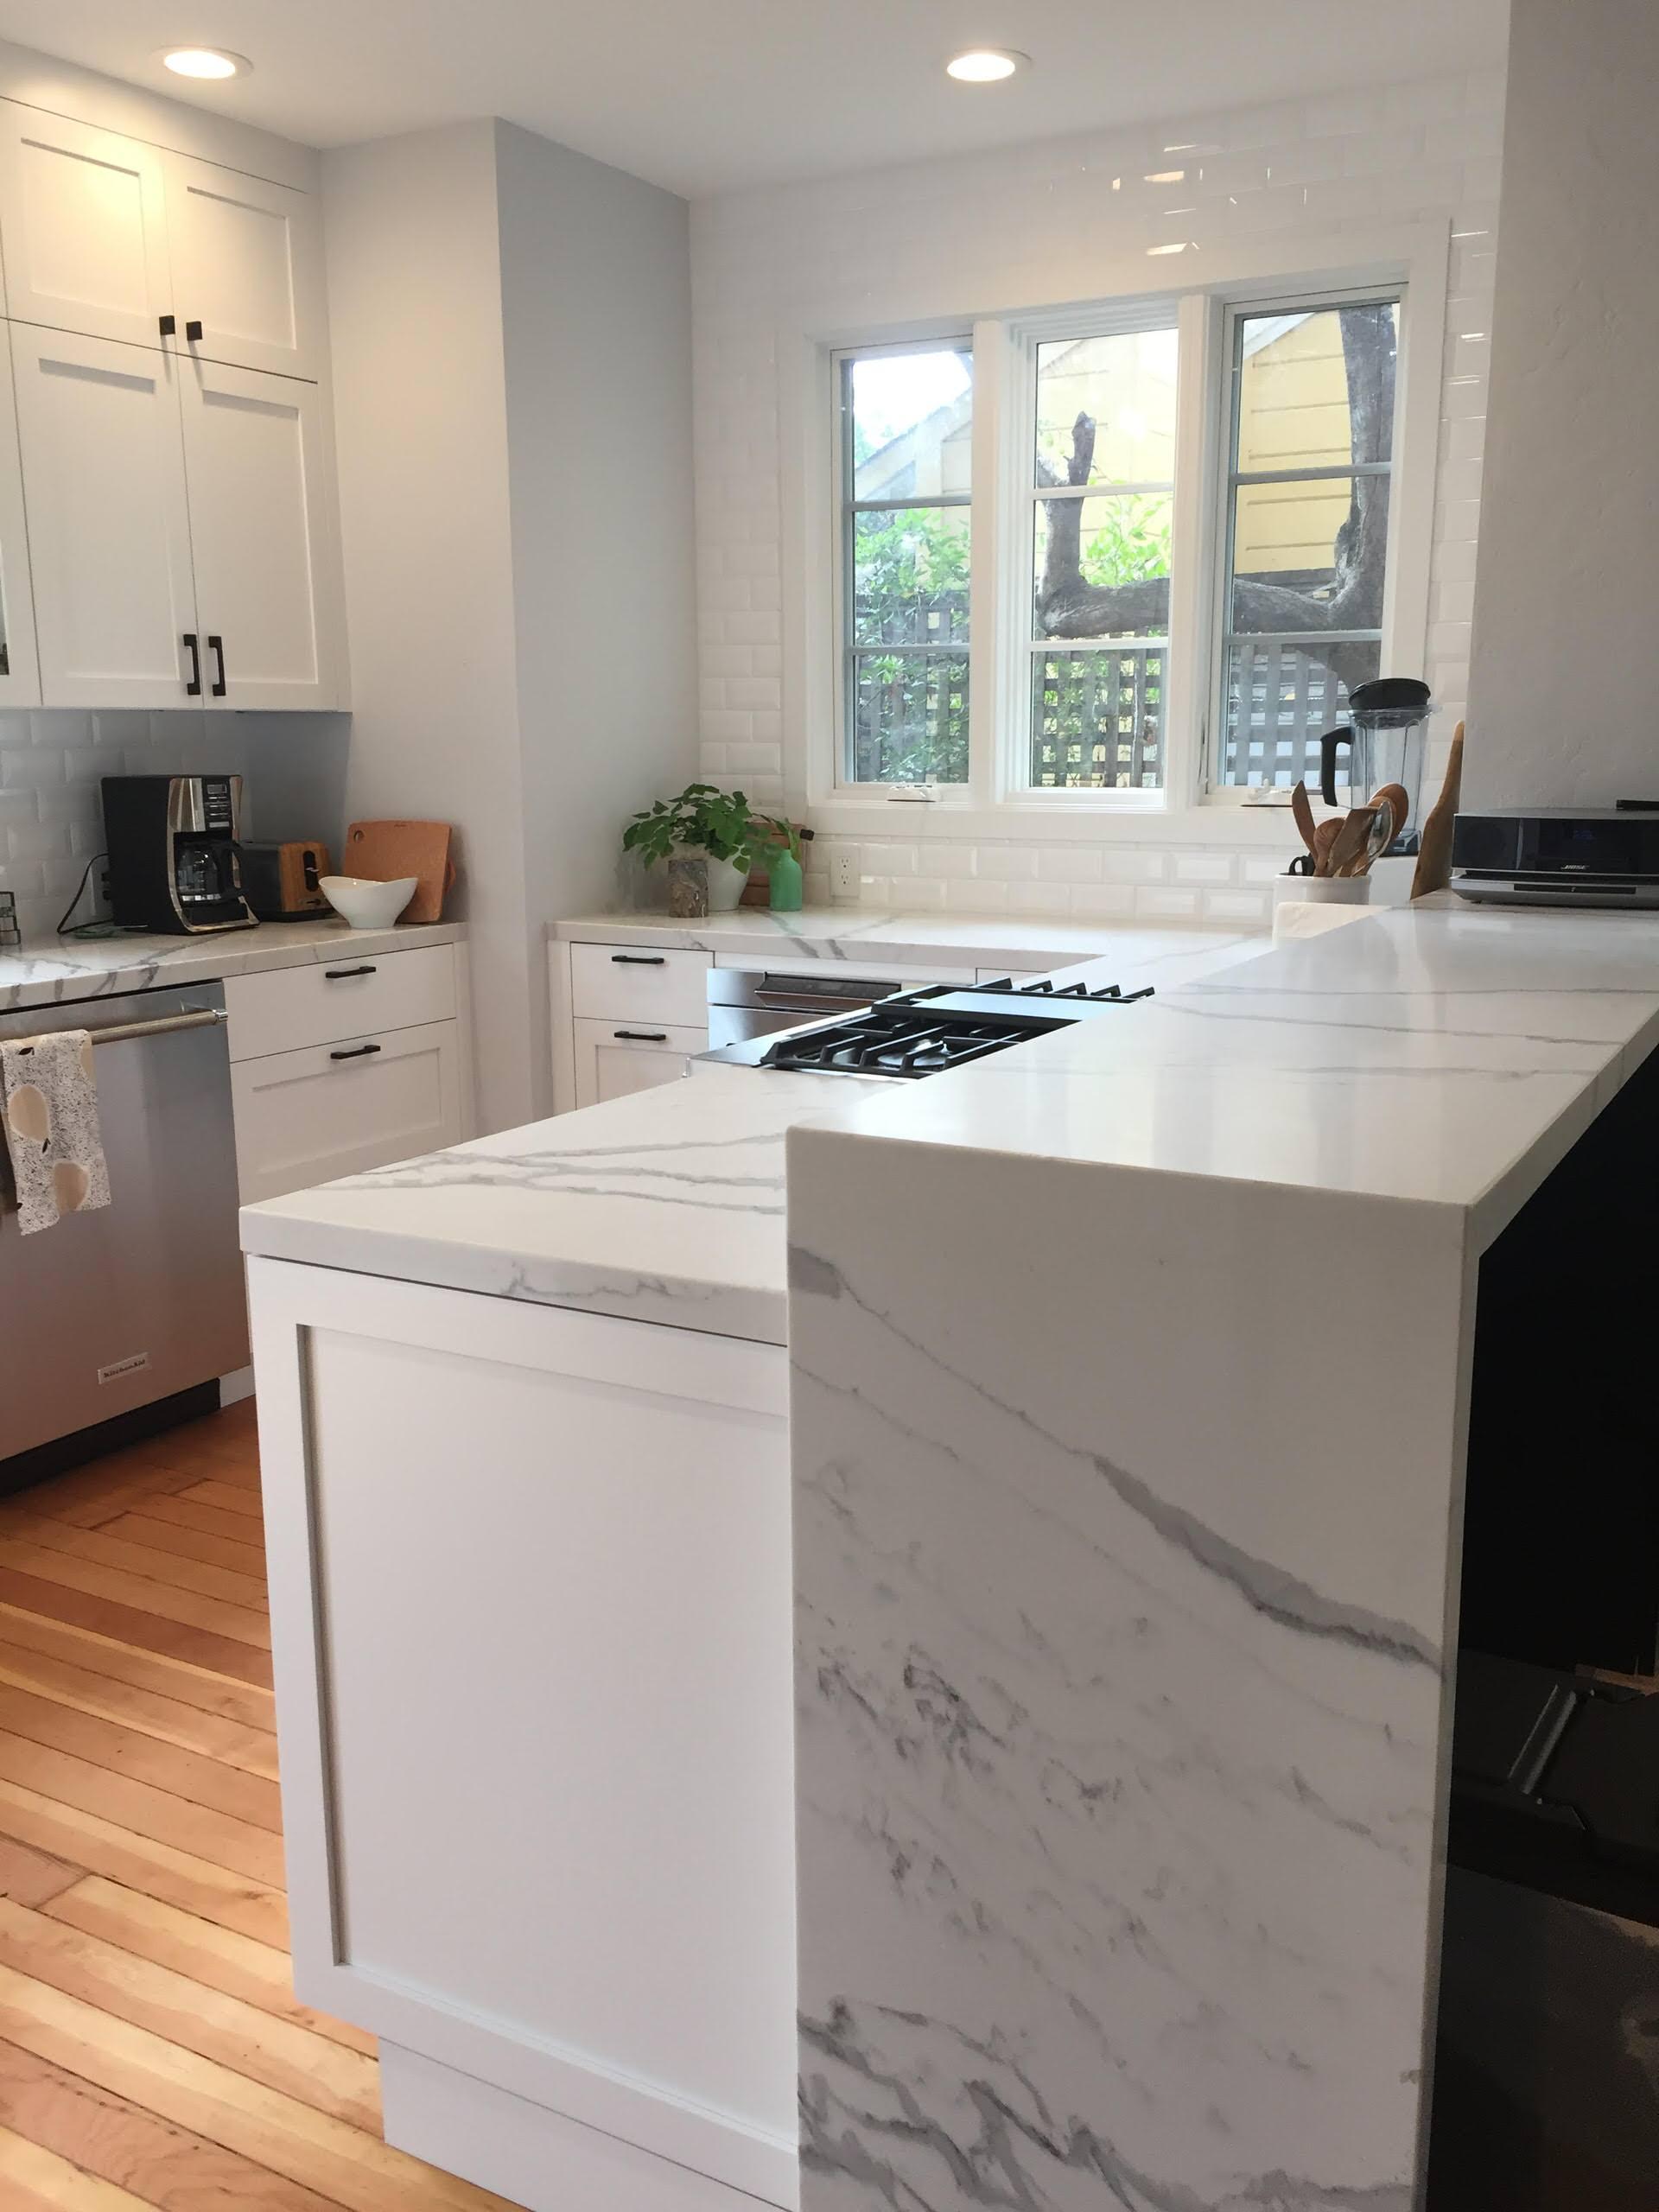 Kitchen Renovation, Laurel Dsitrict, 2017